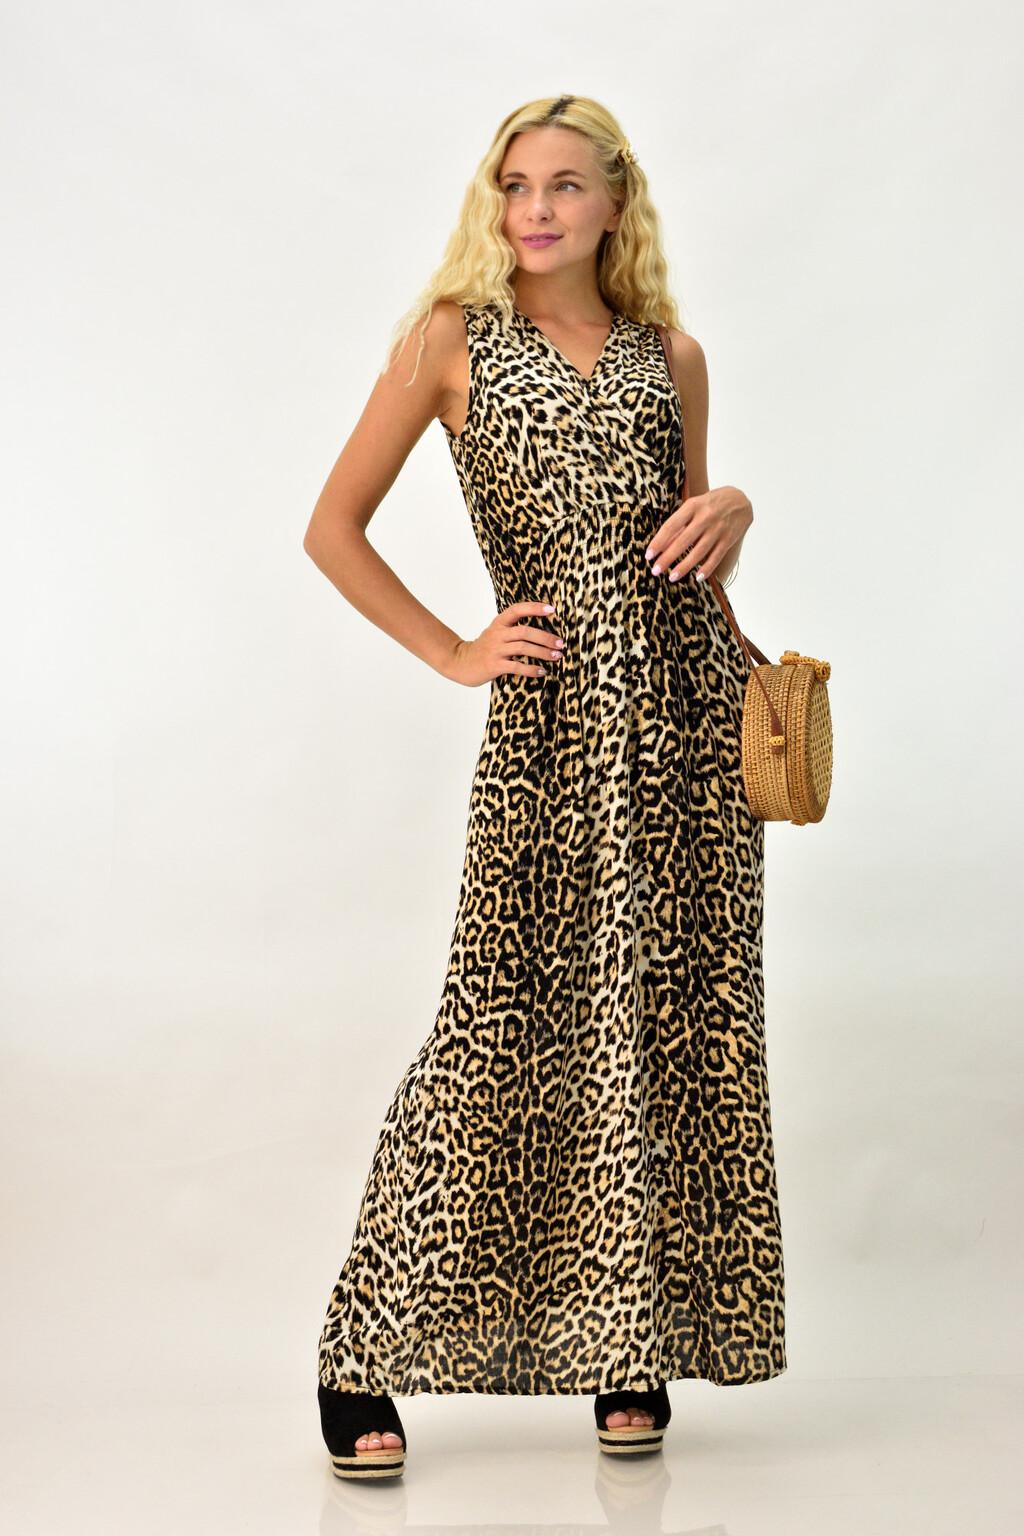 4e8e5b2065f Μακρύ κρουαζέ φόρεμα animal print | Καθημερινά Φορέματα | POTRE